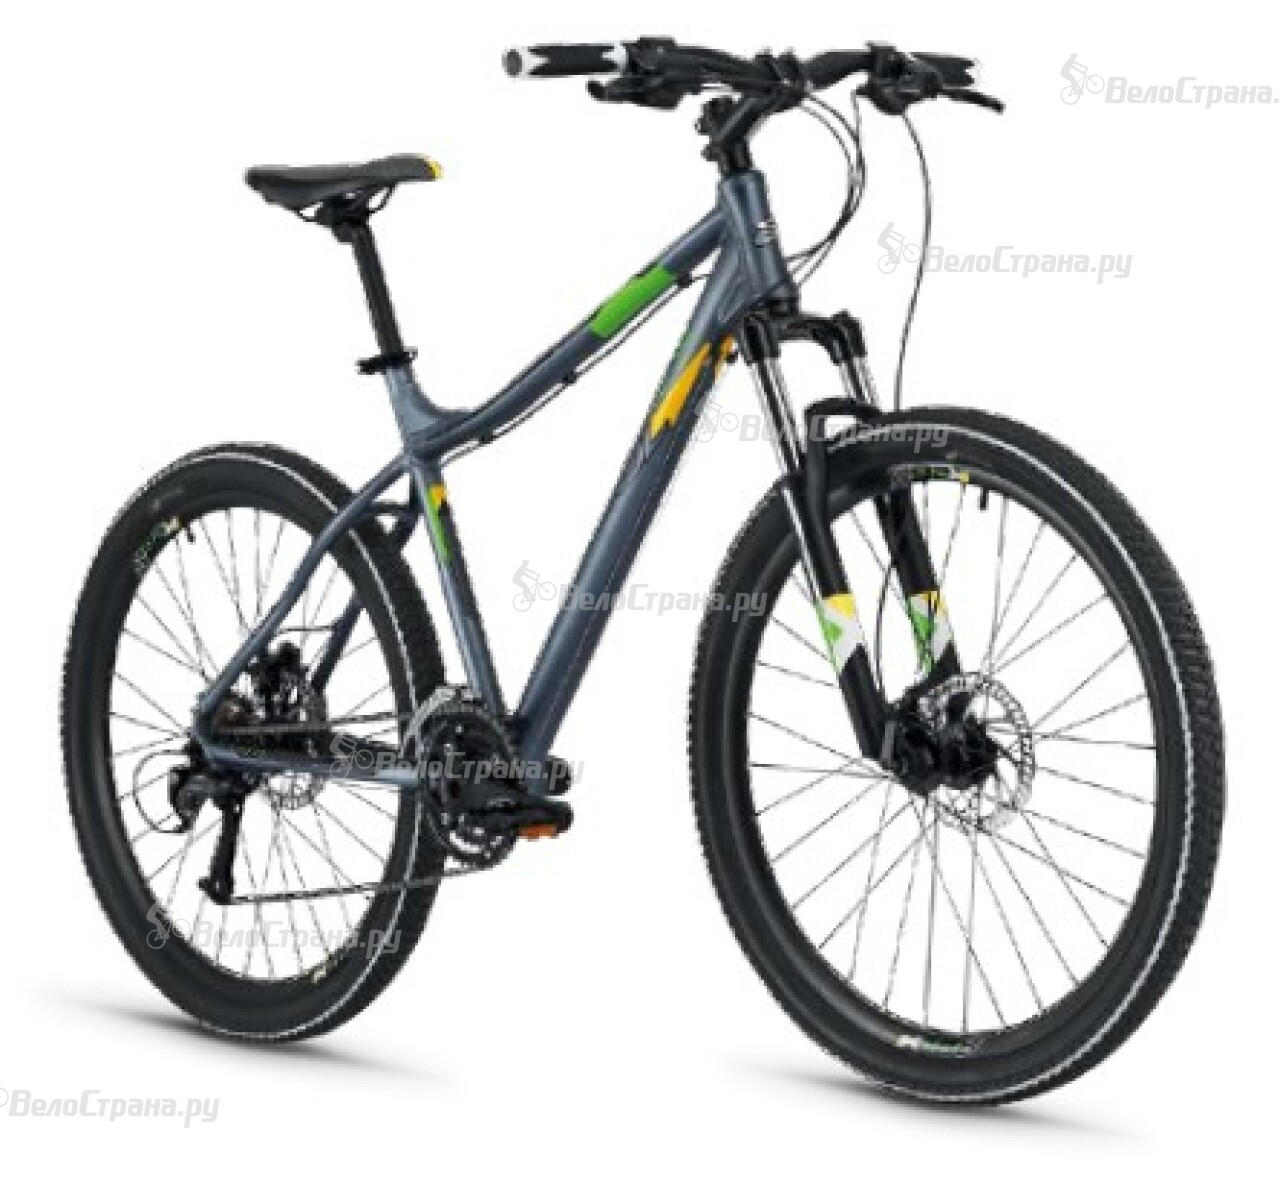 Велосипед Scool troX PRO 26 27S (2014)